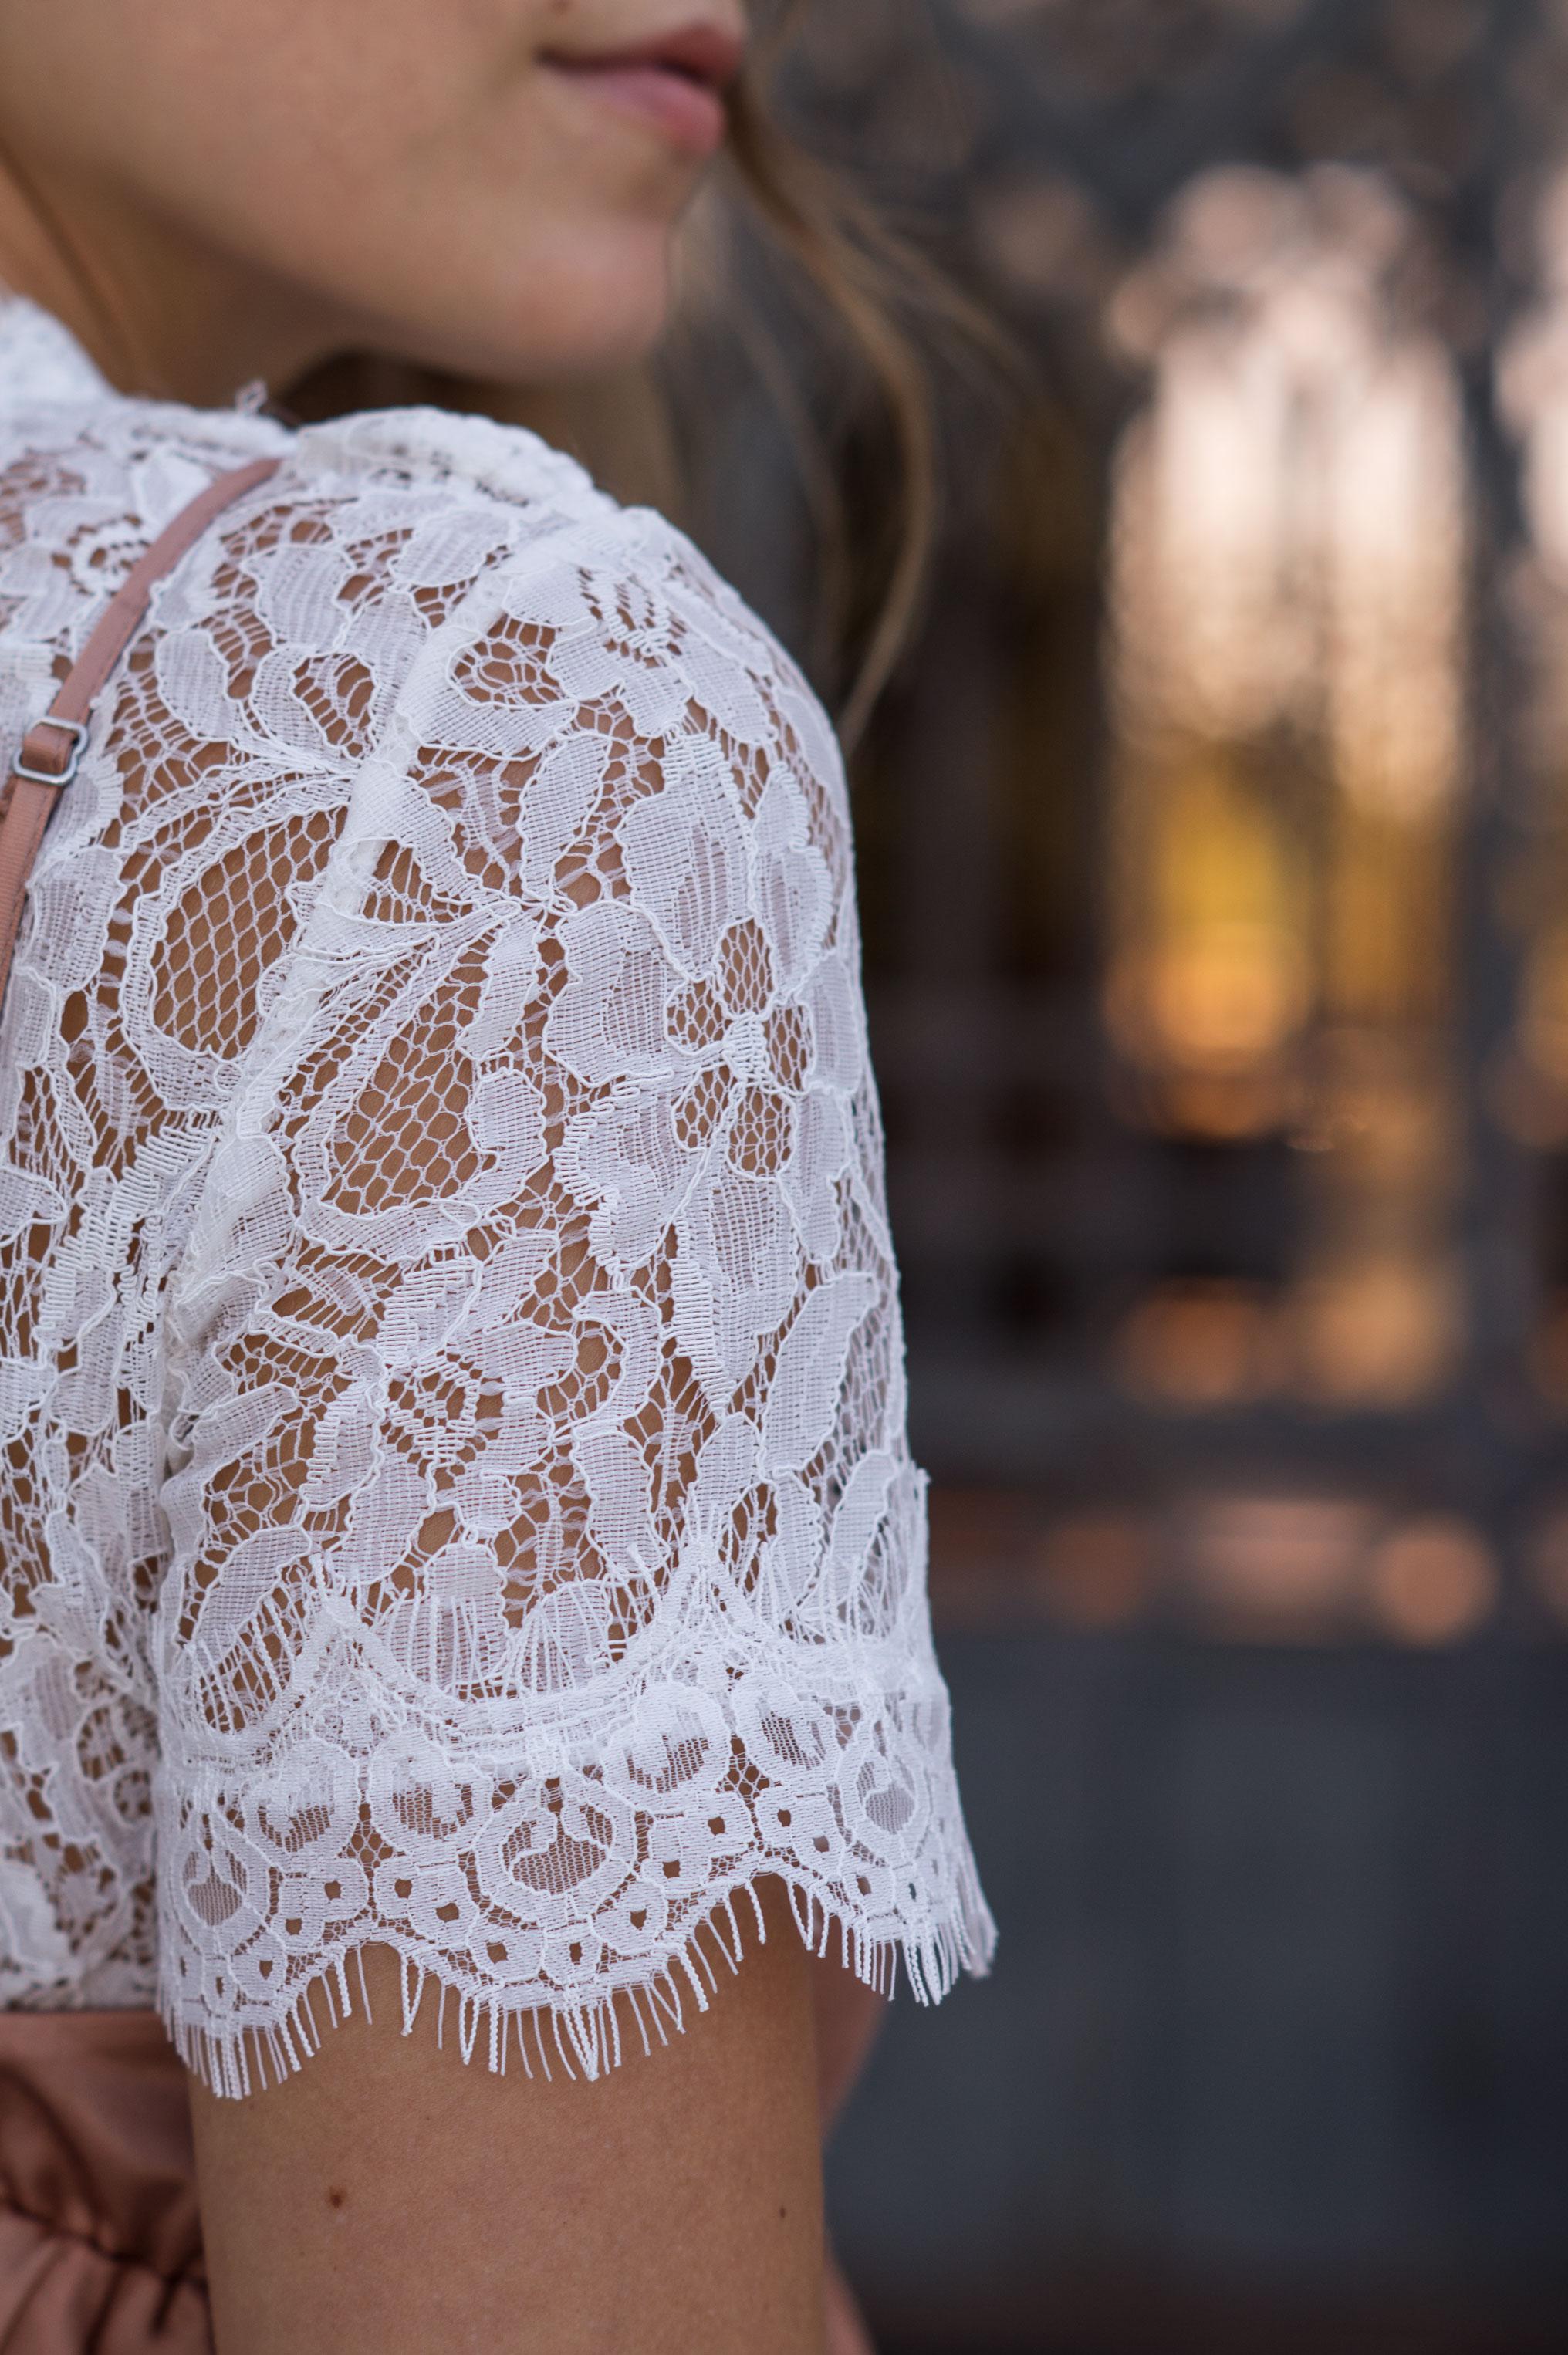 Copper Slipdress rosa Satinkleid silk dress ruffles Rüschenkleid H&M Sariety Modeblog Heidelberg Fashionblogger Milan Mailand Shooting-22